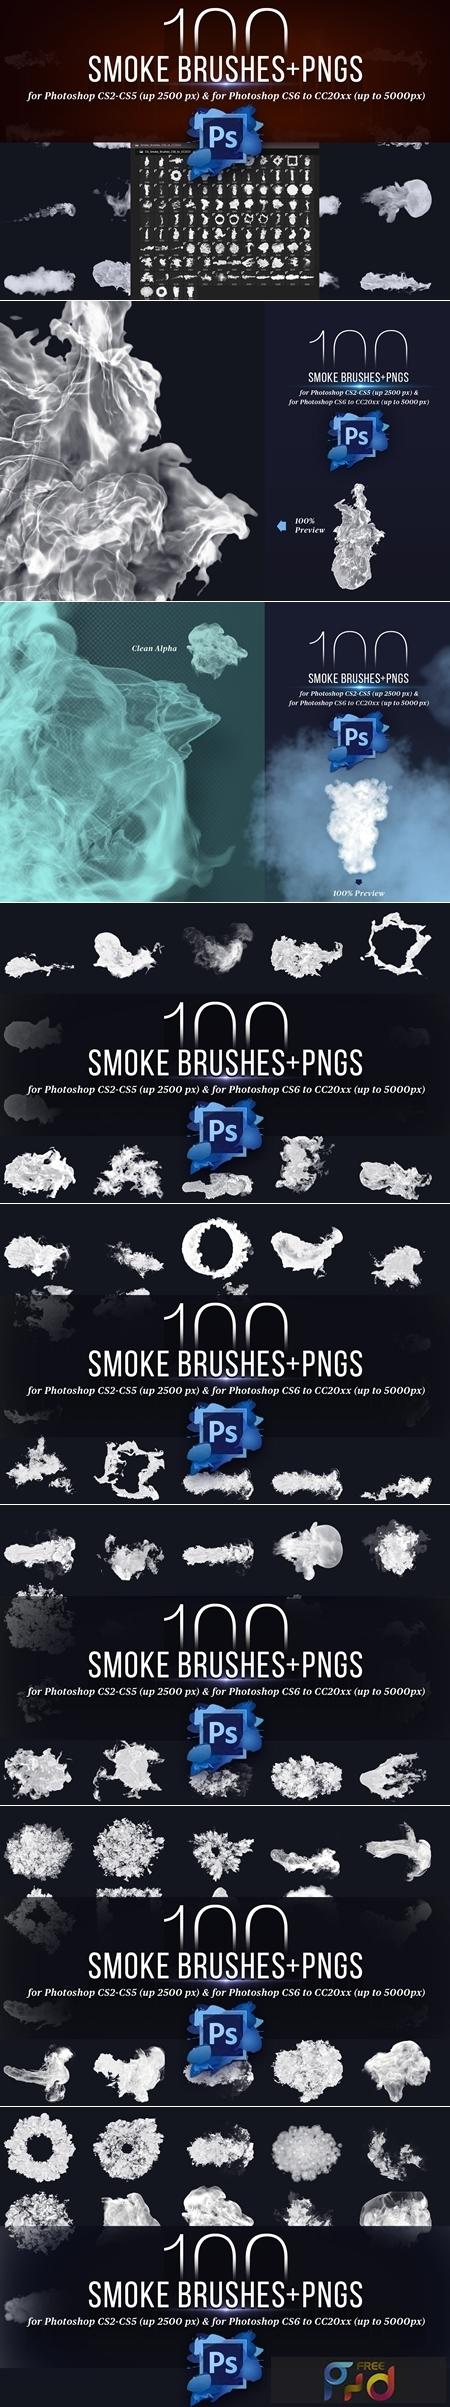 100 Photoshop Smoke Brushes + PNGs 4421254 1